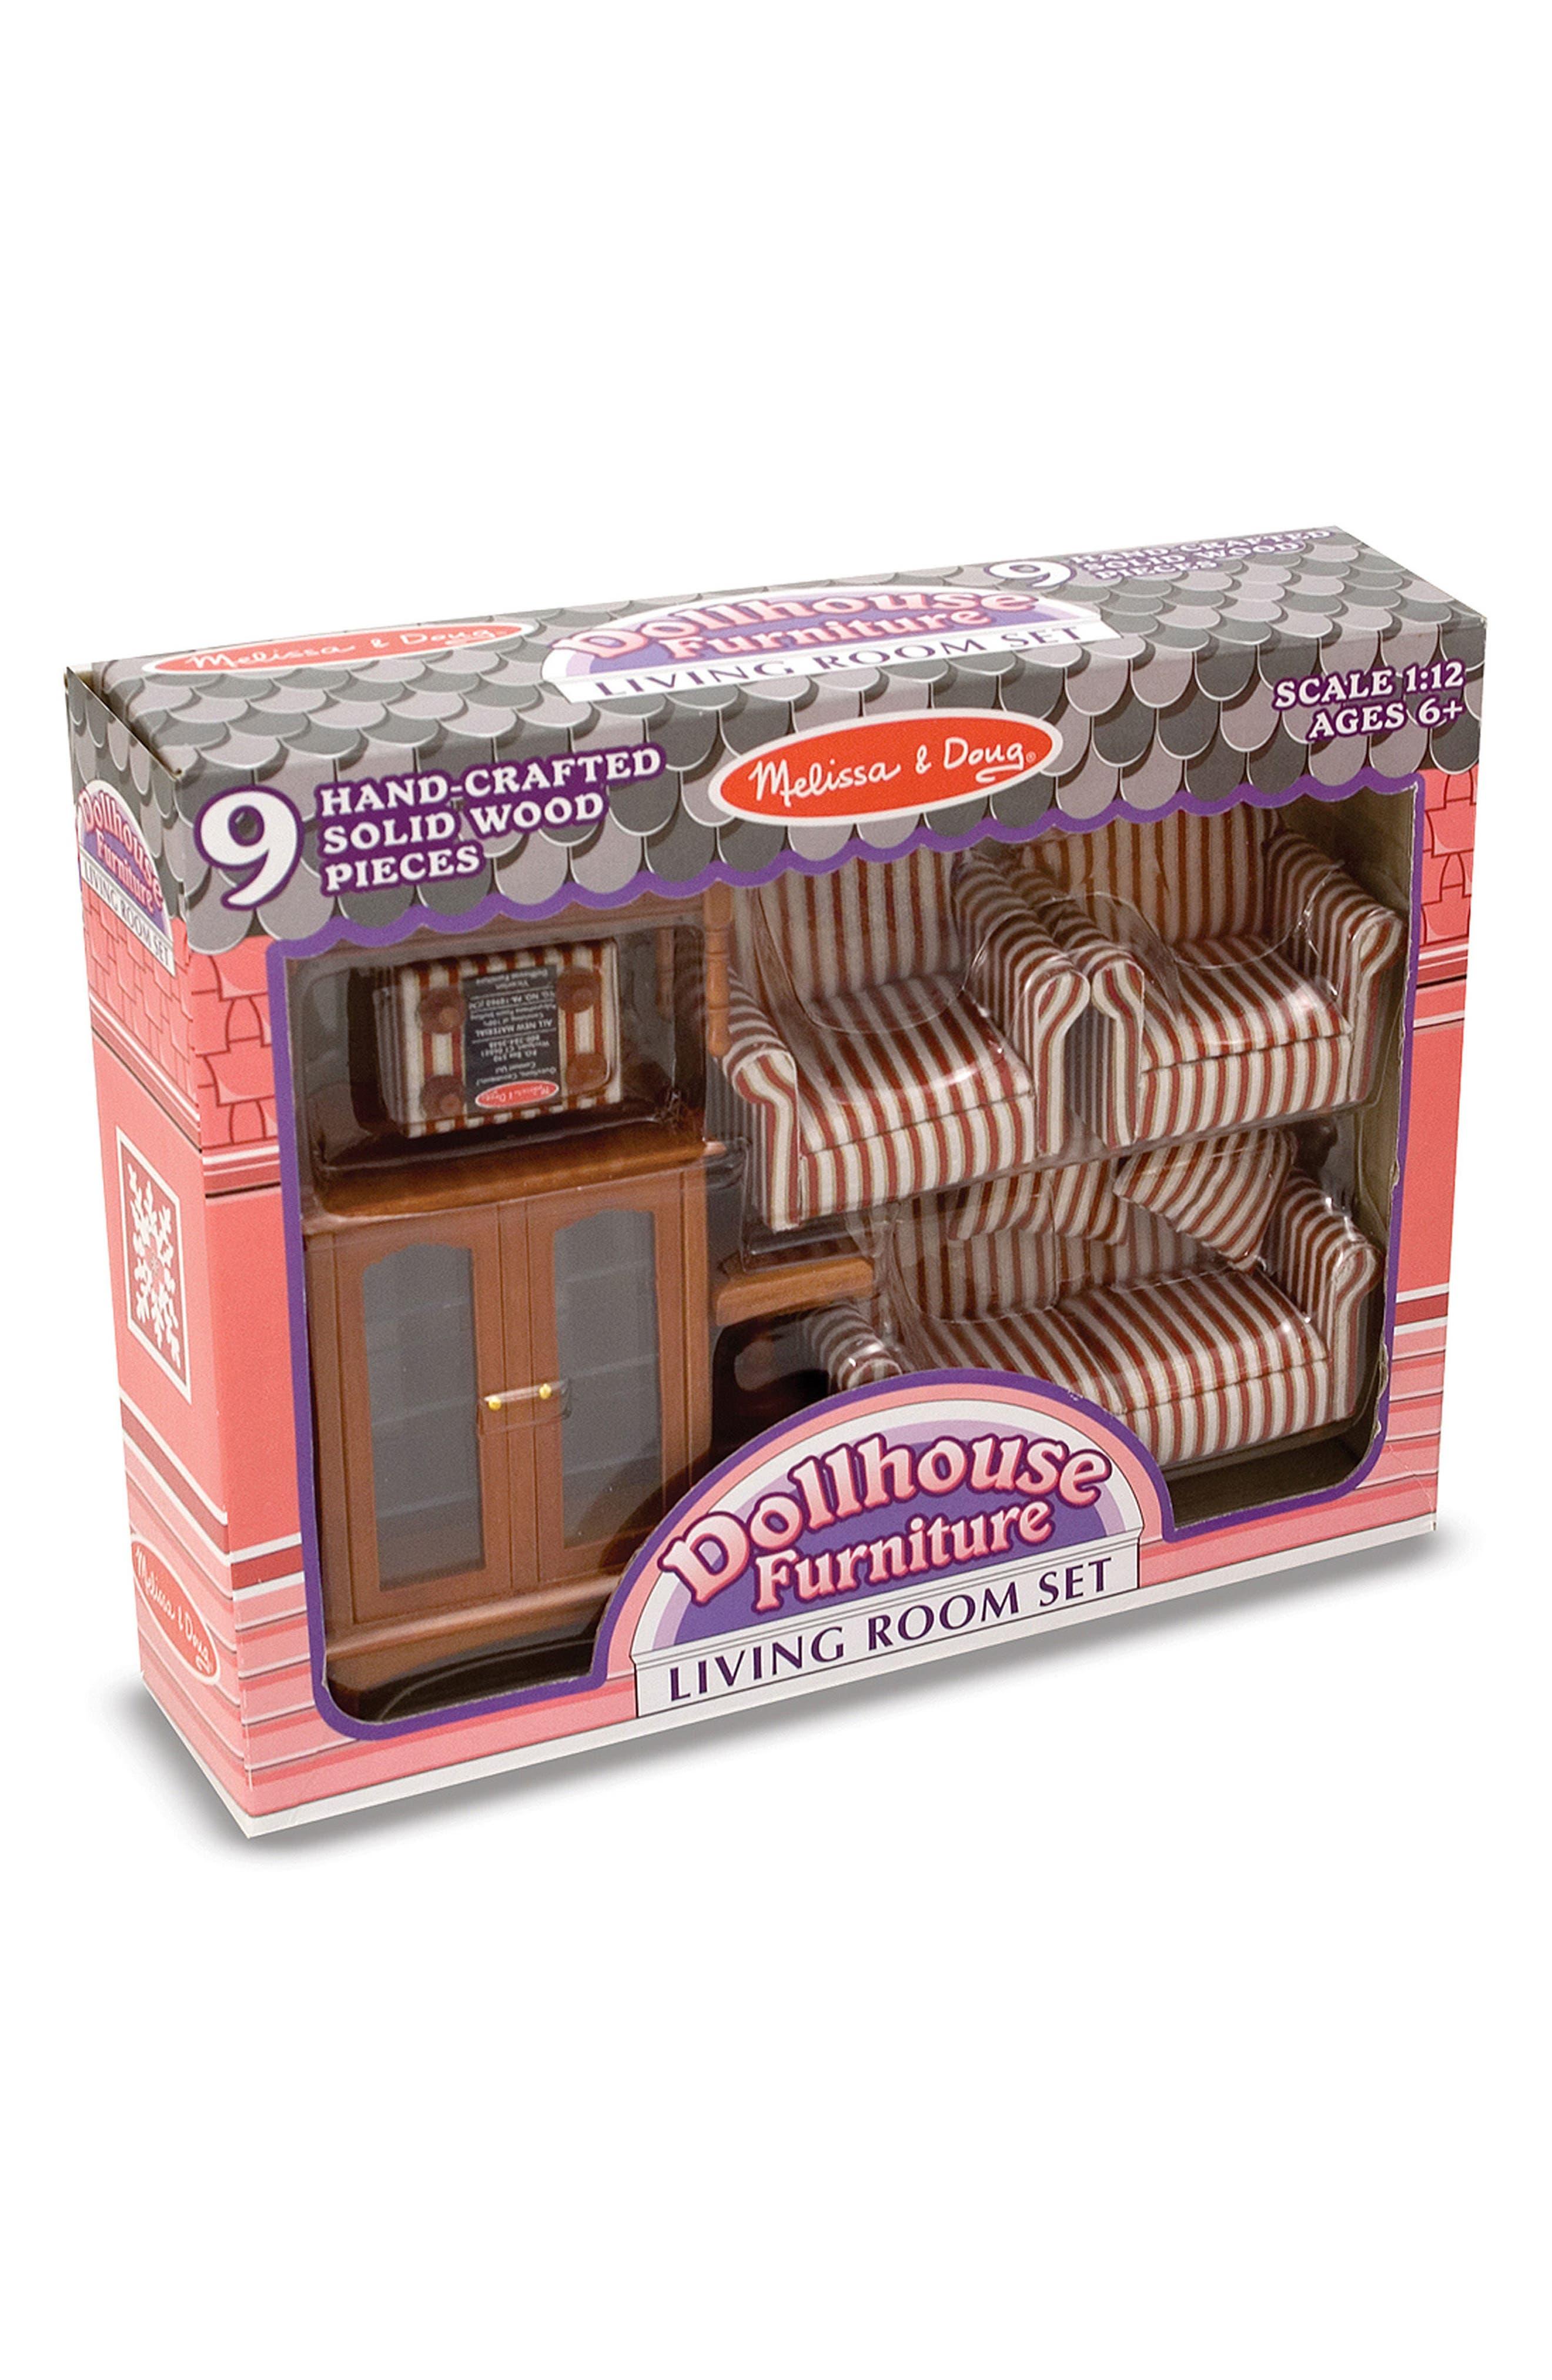 Melissa & Doug 1:12 Scale Dollhouse Living Room Furniture